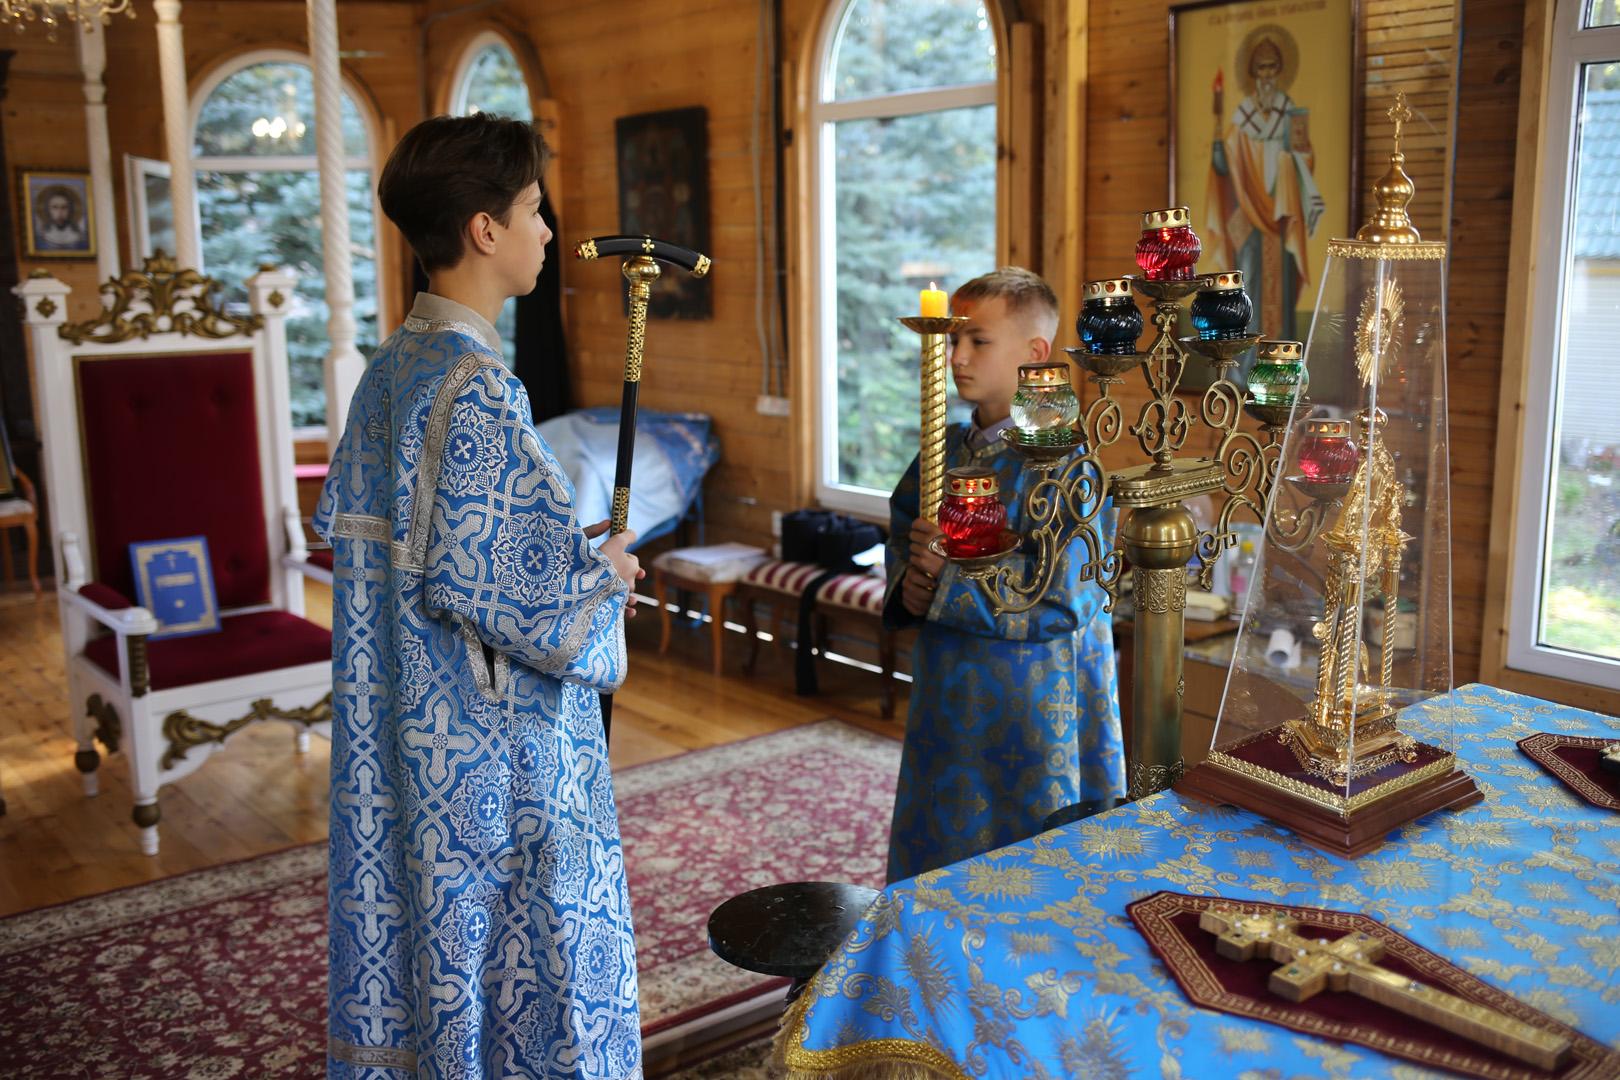 http://monuspen.ru/photoreports/c921fa66433a9104090f5865f55396ai.jpg